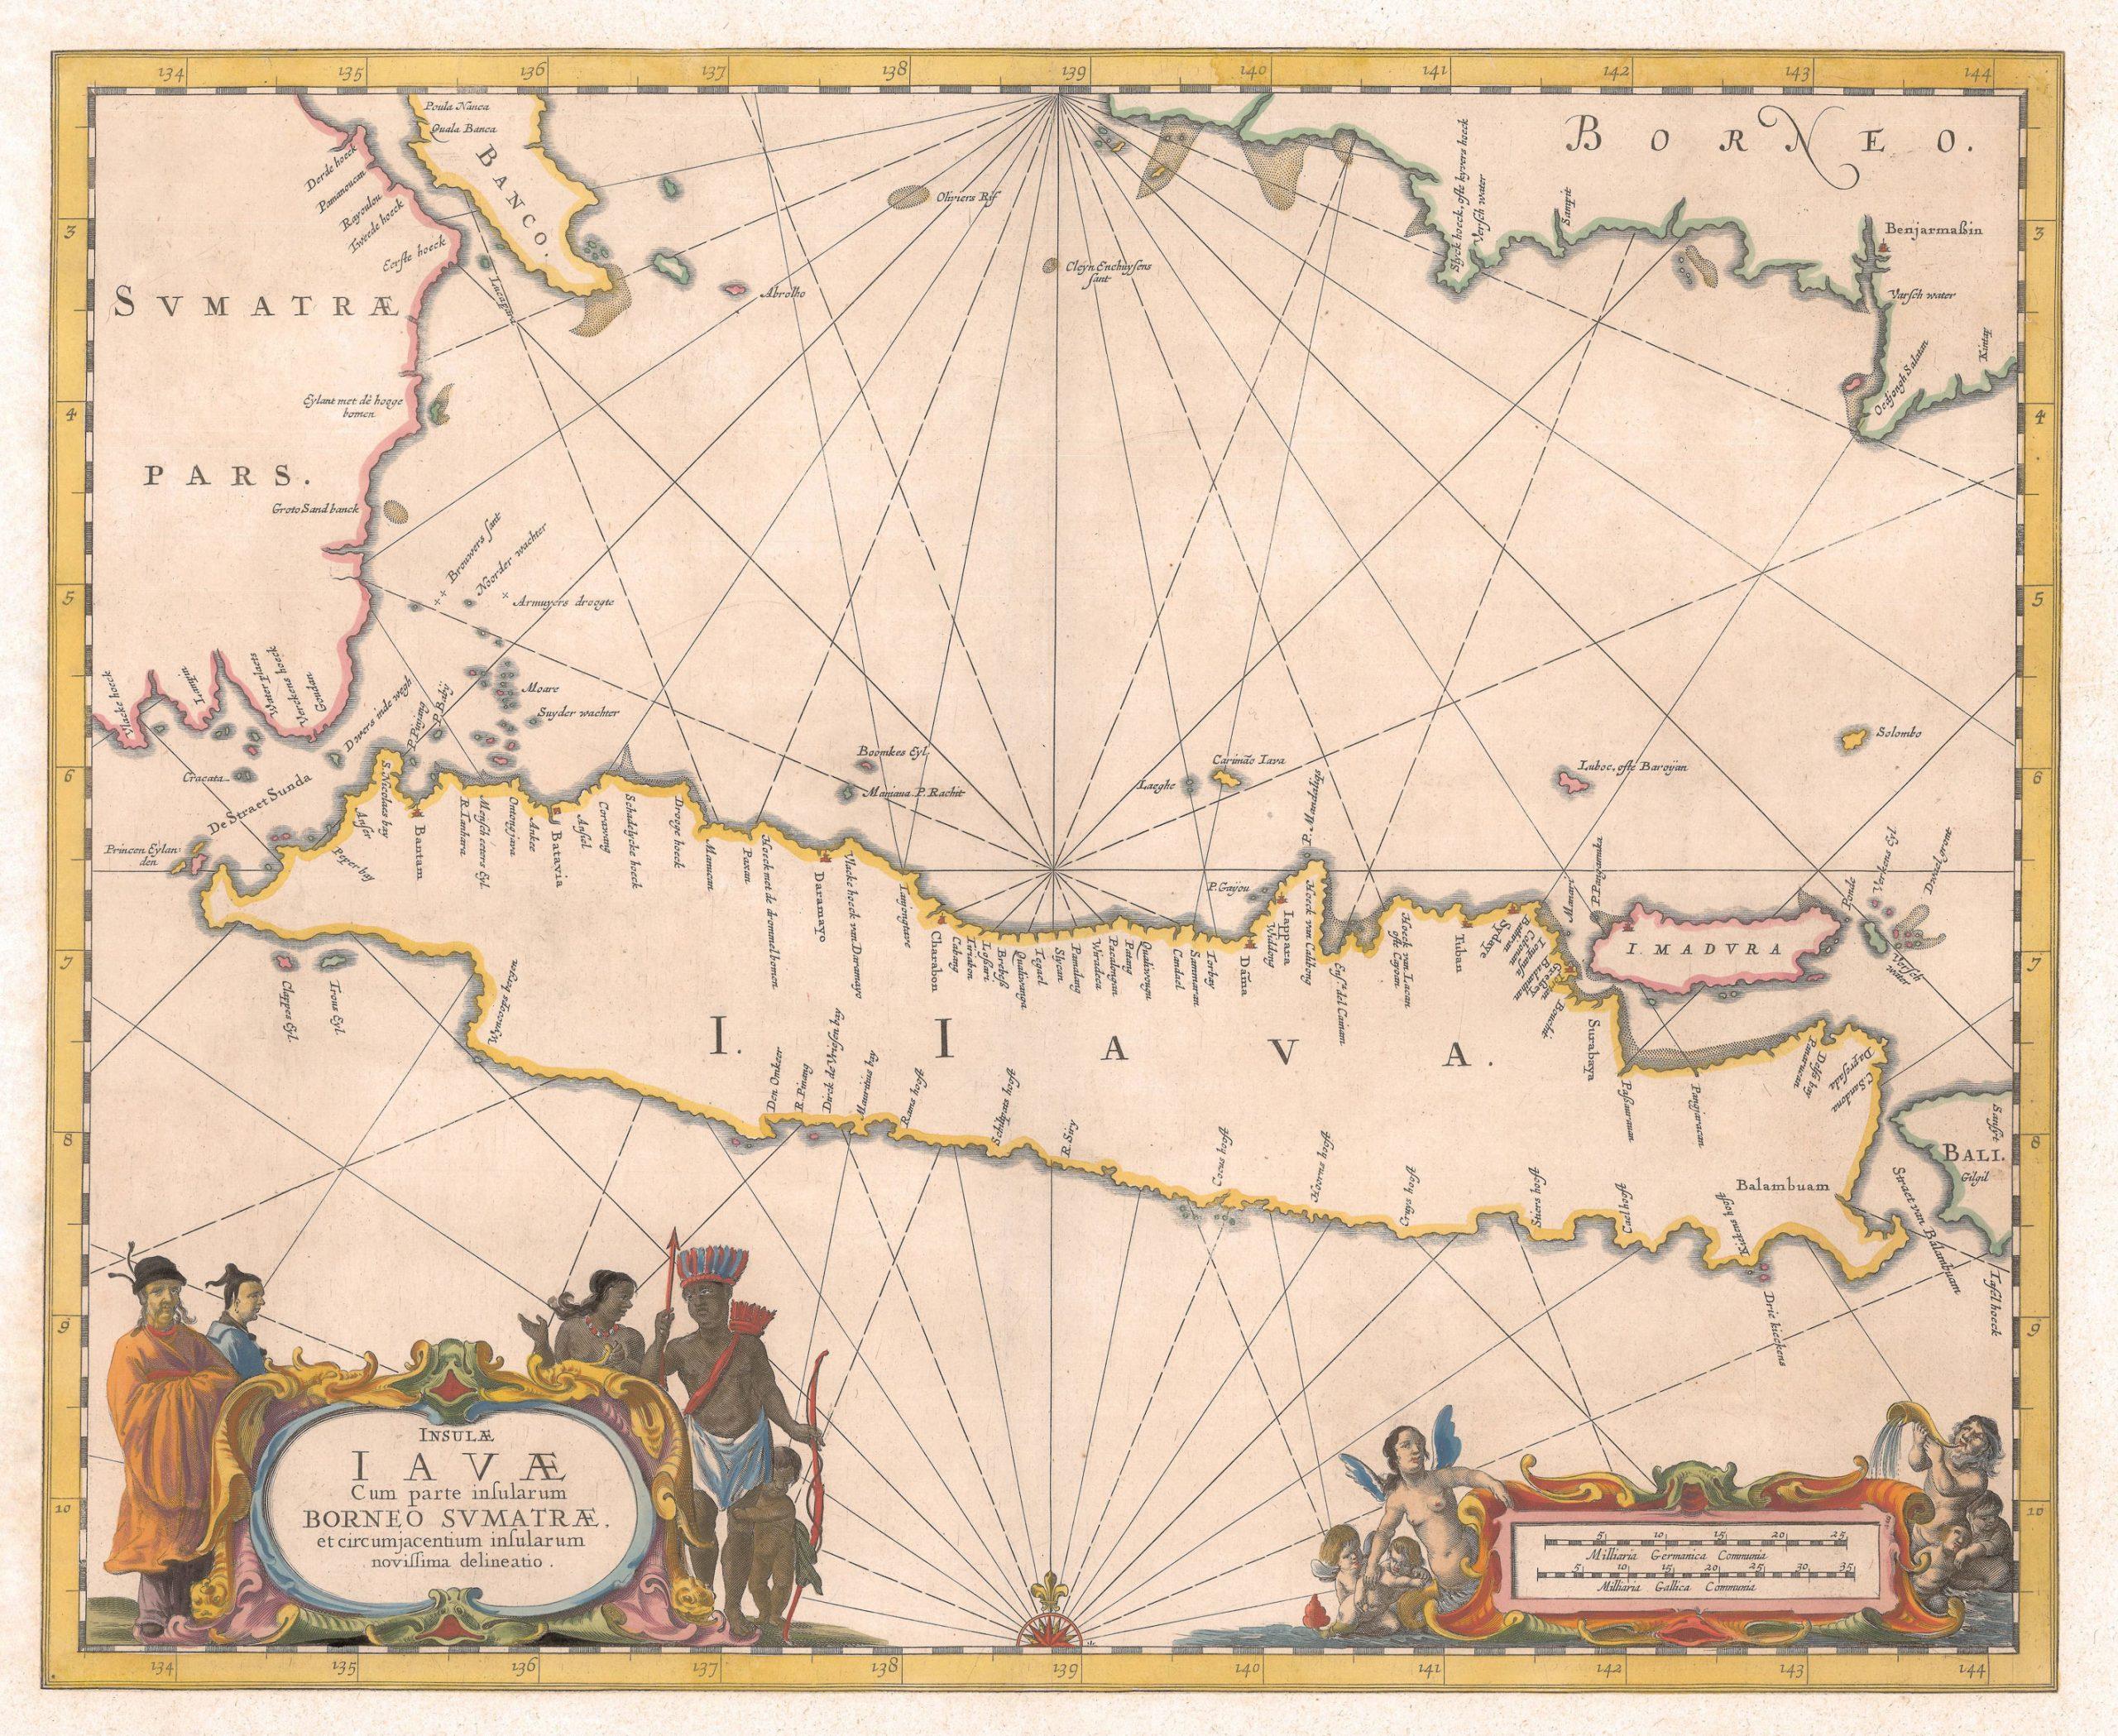 ea Chart of Java Island - Janssonius c.1657